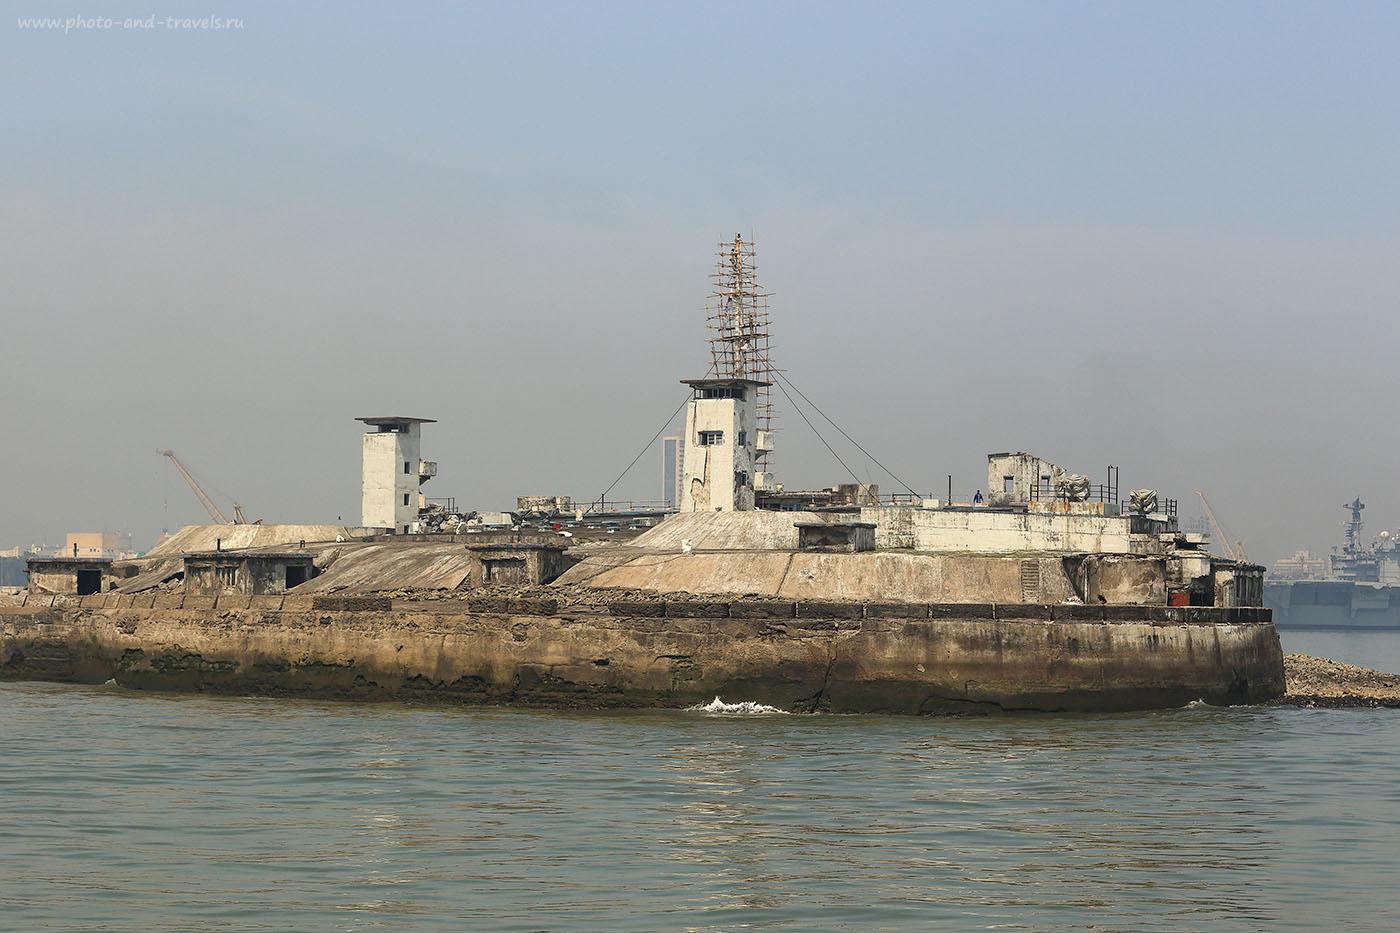 Фото 3. Остров - военная база. (70-200, 1/500, 0eV, f9, 70mm, ISO 100)